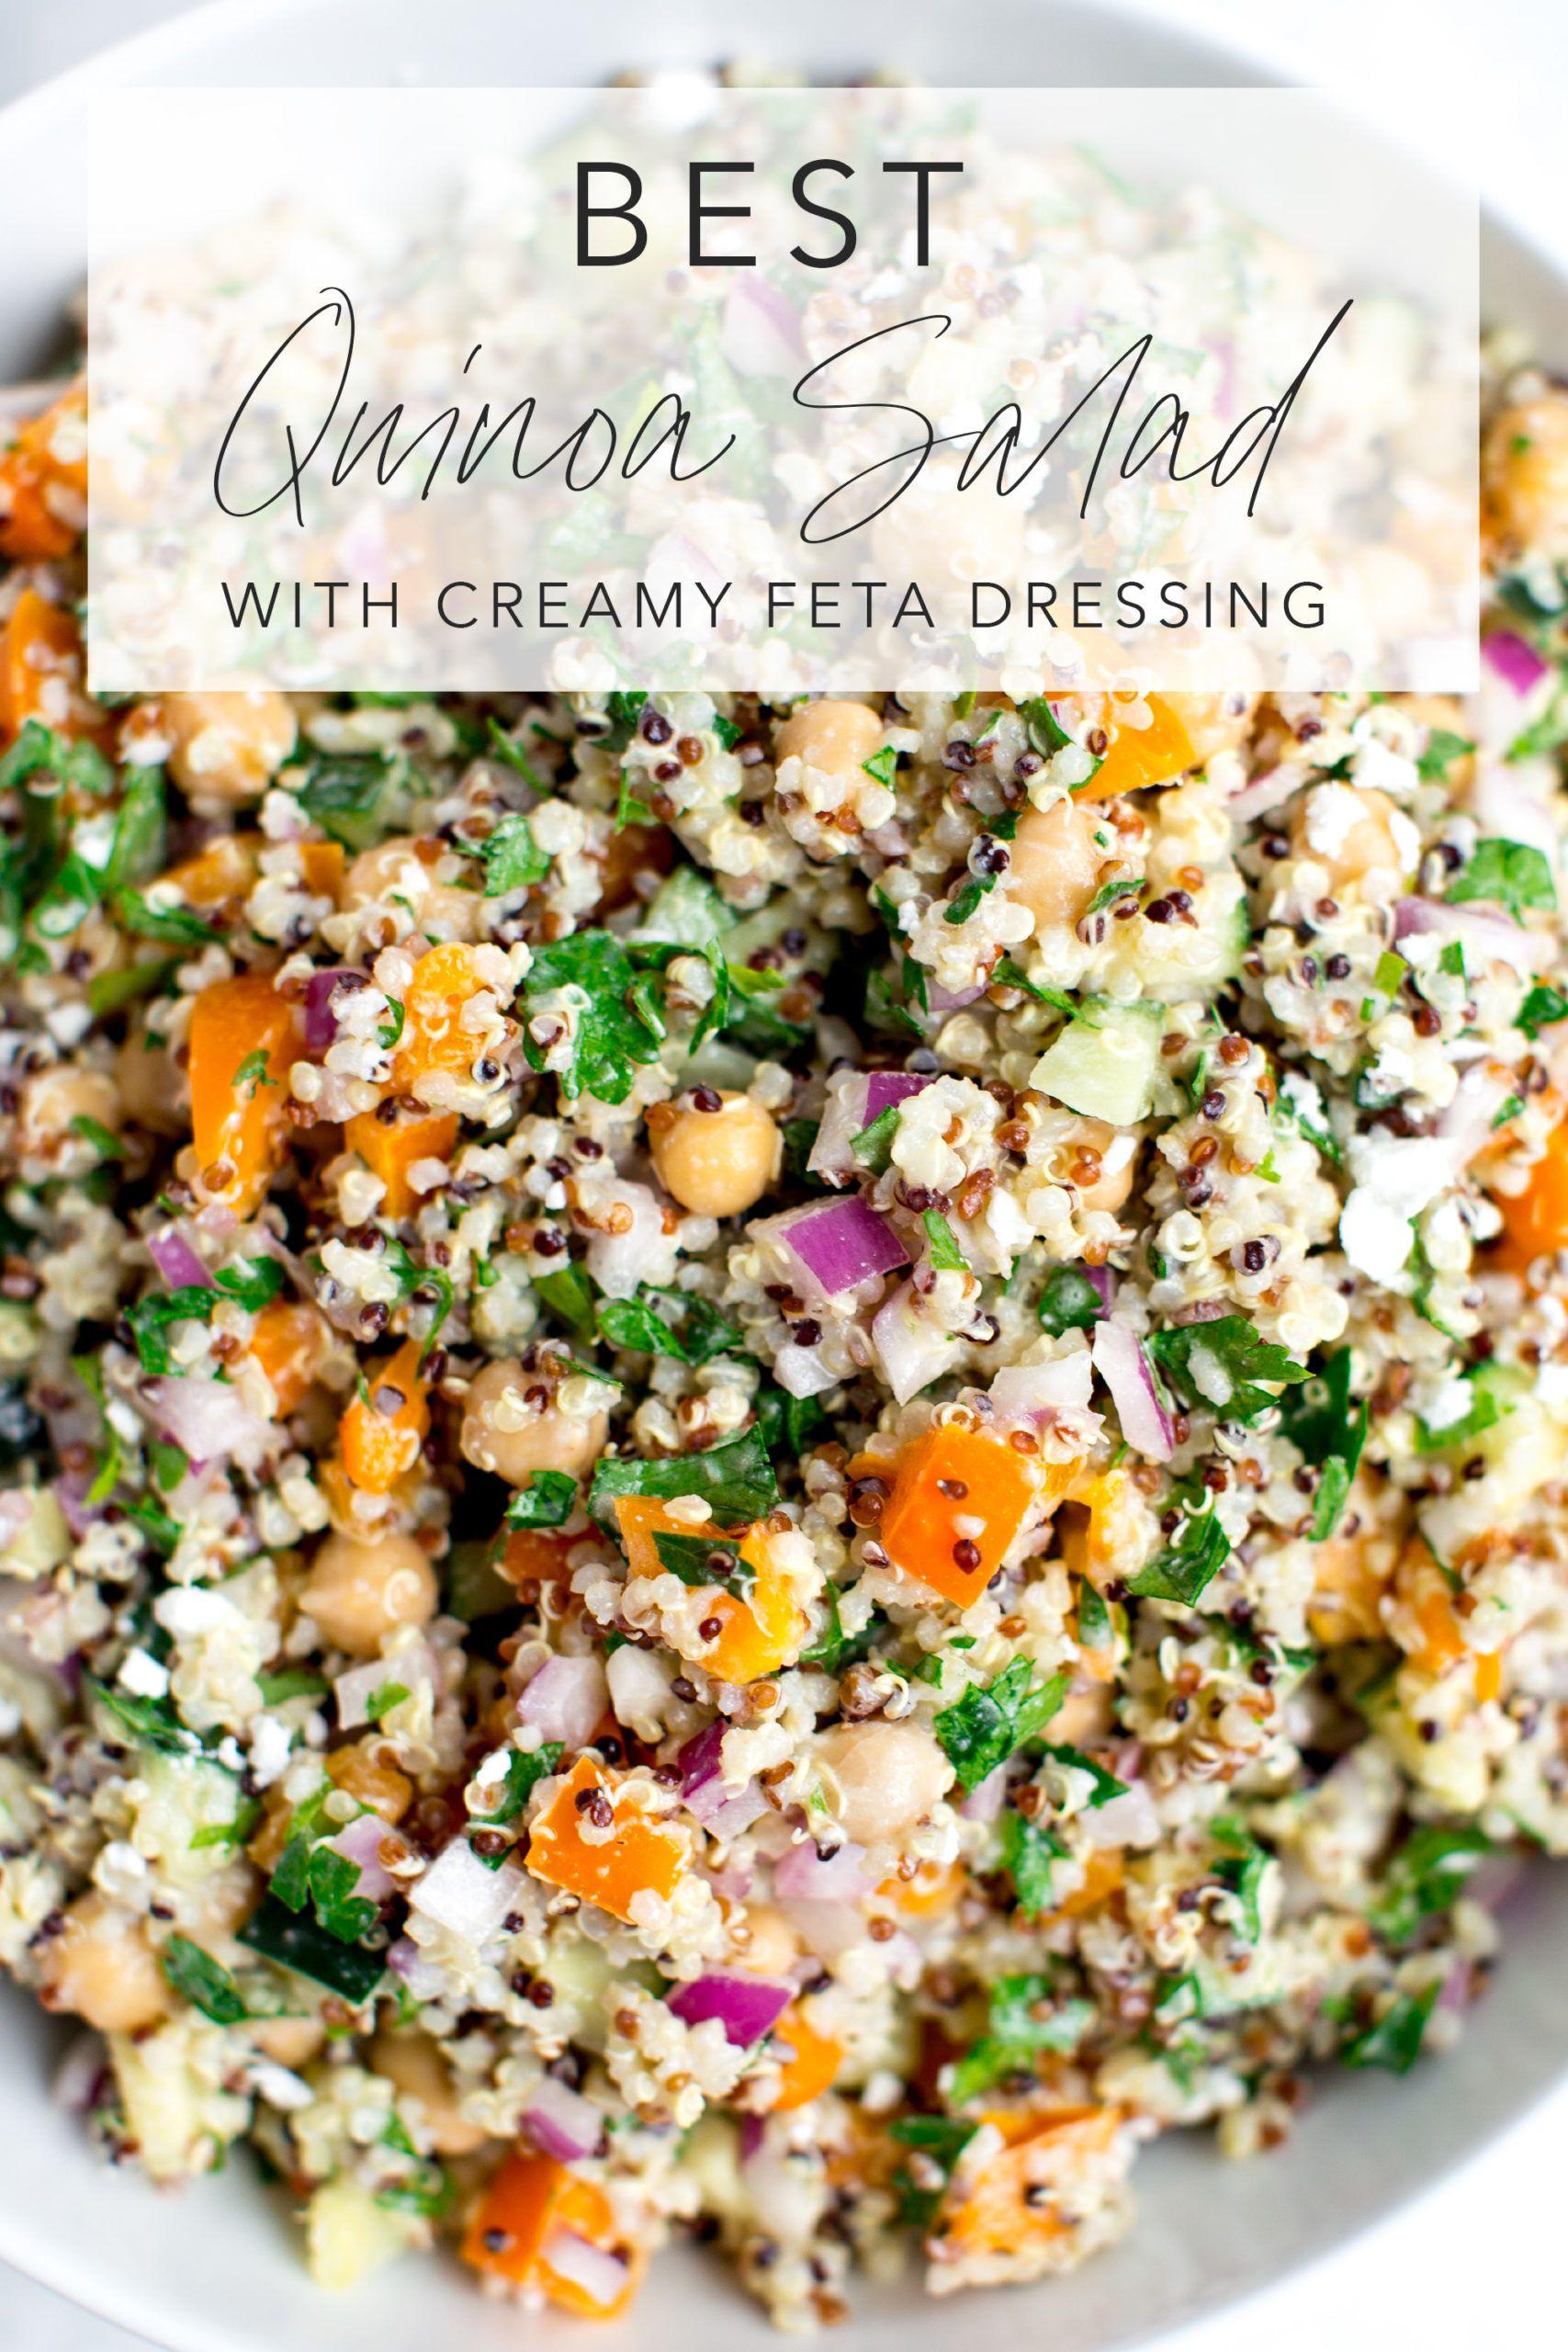 Best Quinoa Salad with Creamy Feta Dressing